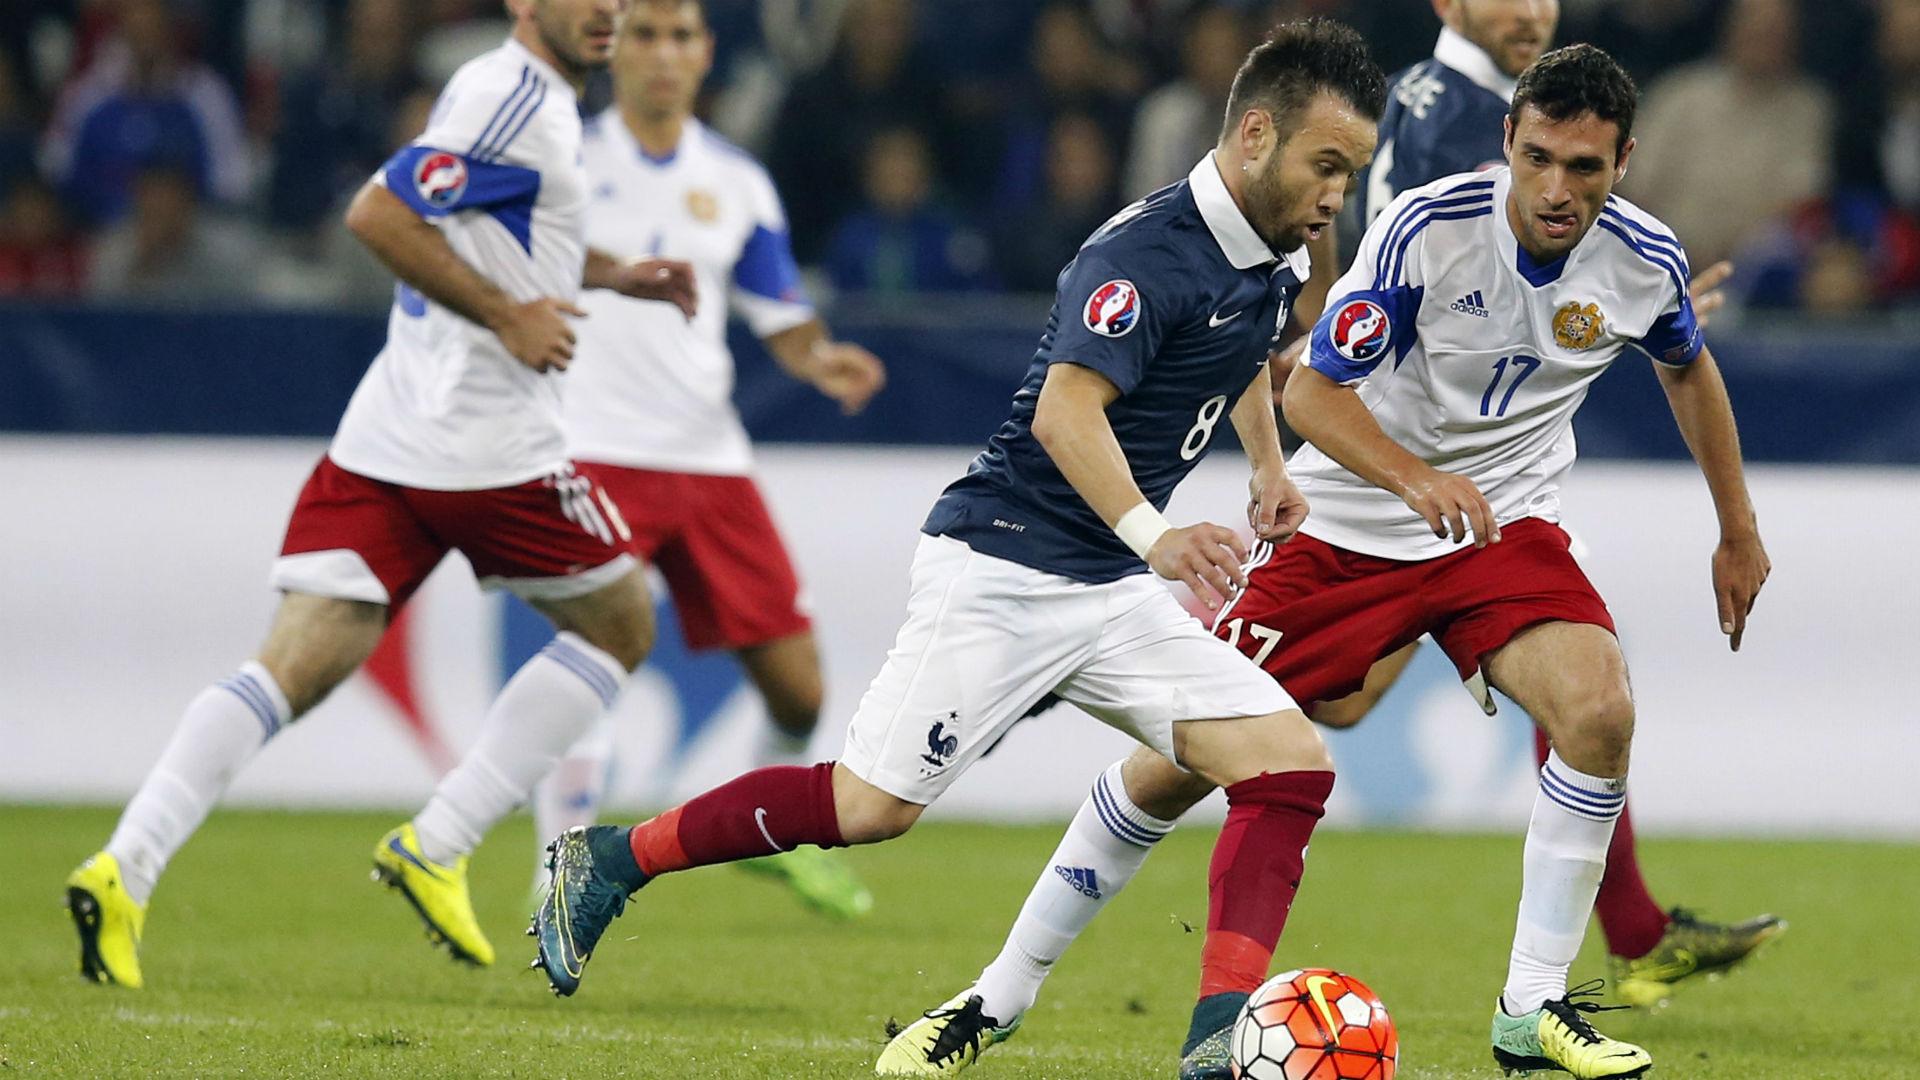 Equipe de France : Deschamps évoque la première de Ben Yedder et Hernandez !